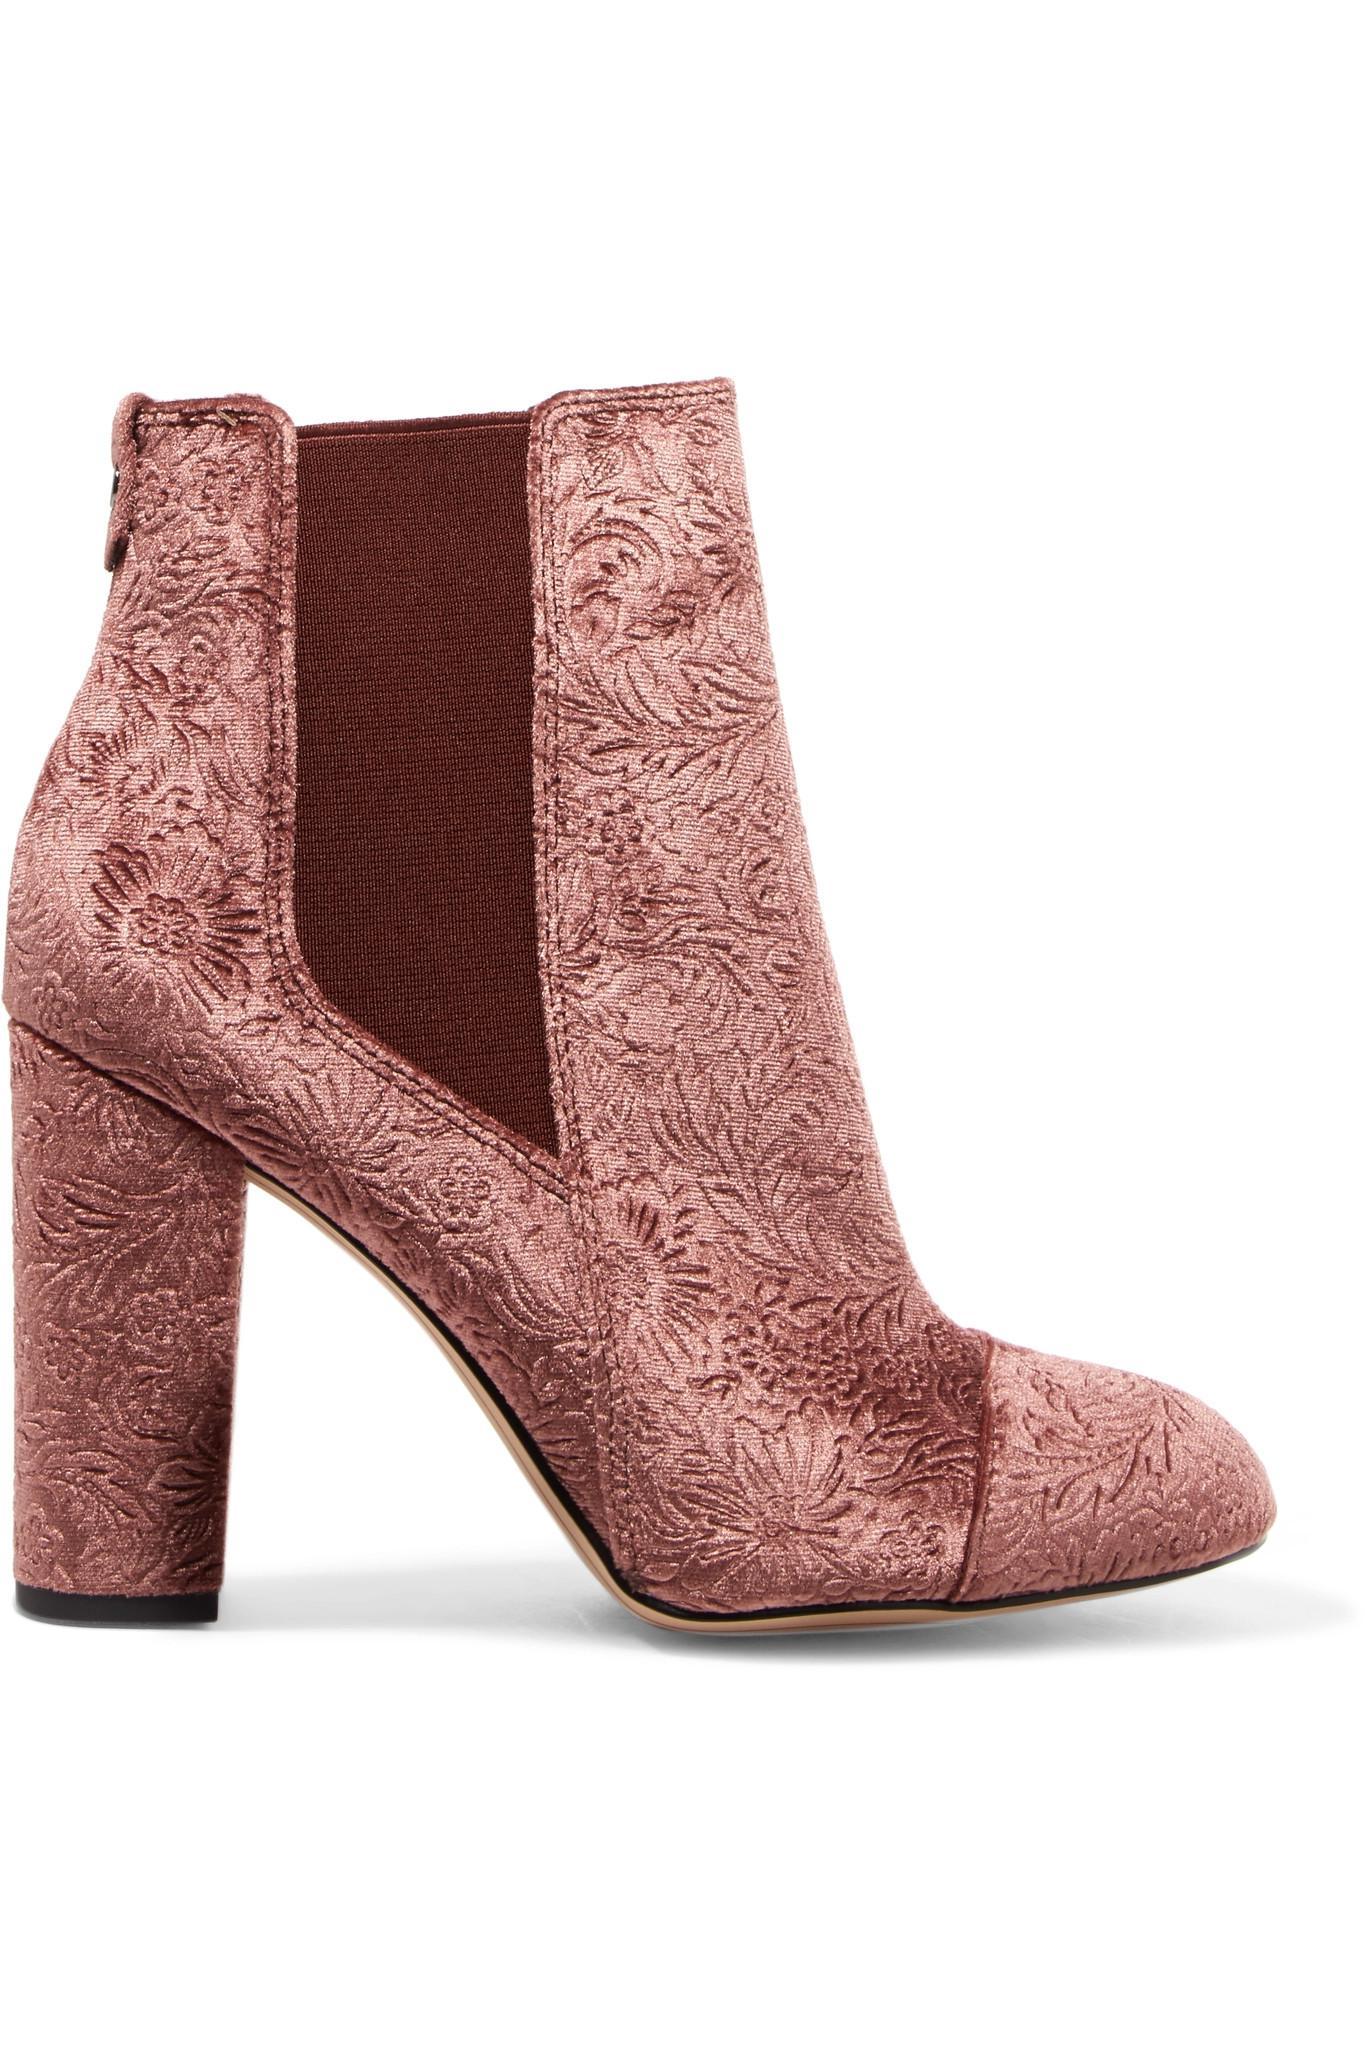 200e0a026cf2d9 Gallery. Previously sold at  NET-A-PORTER · Women s Sam Edelman Tinsley  Women s Chelsea Boots ...